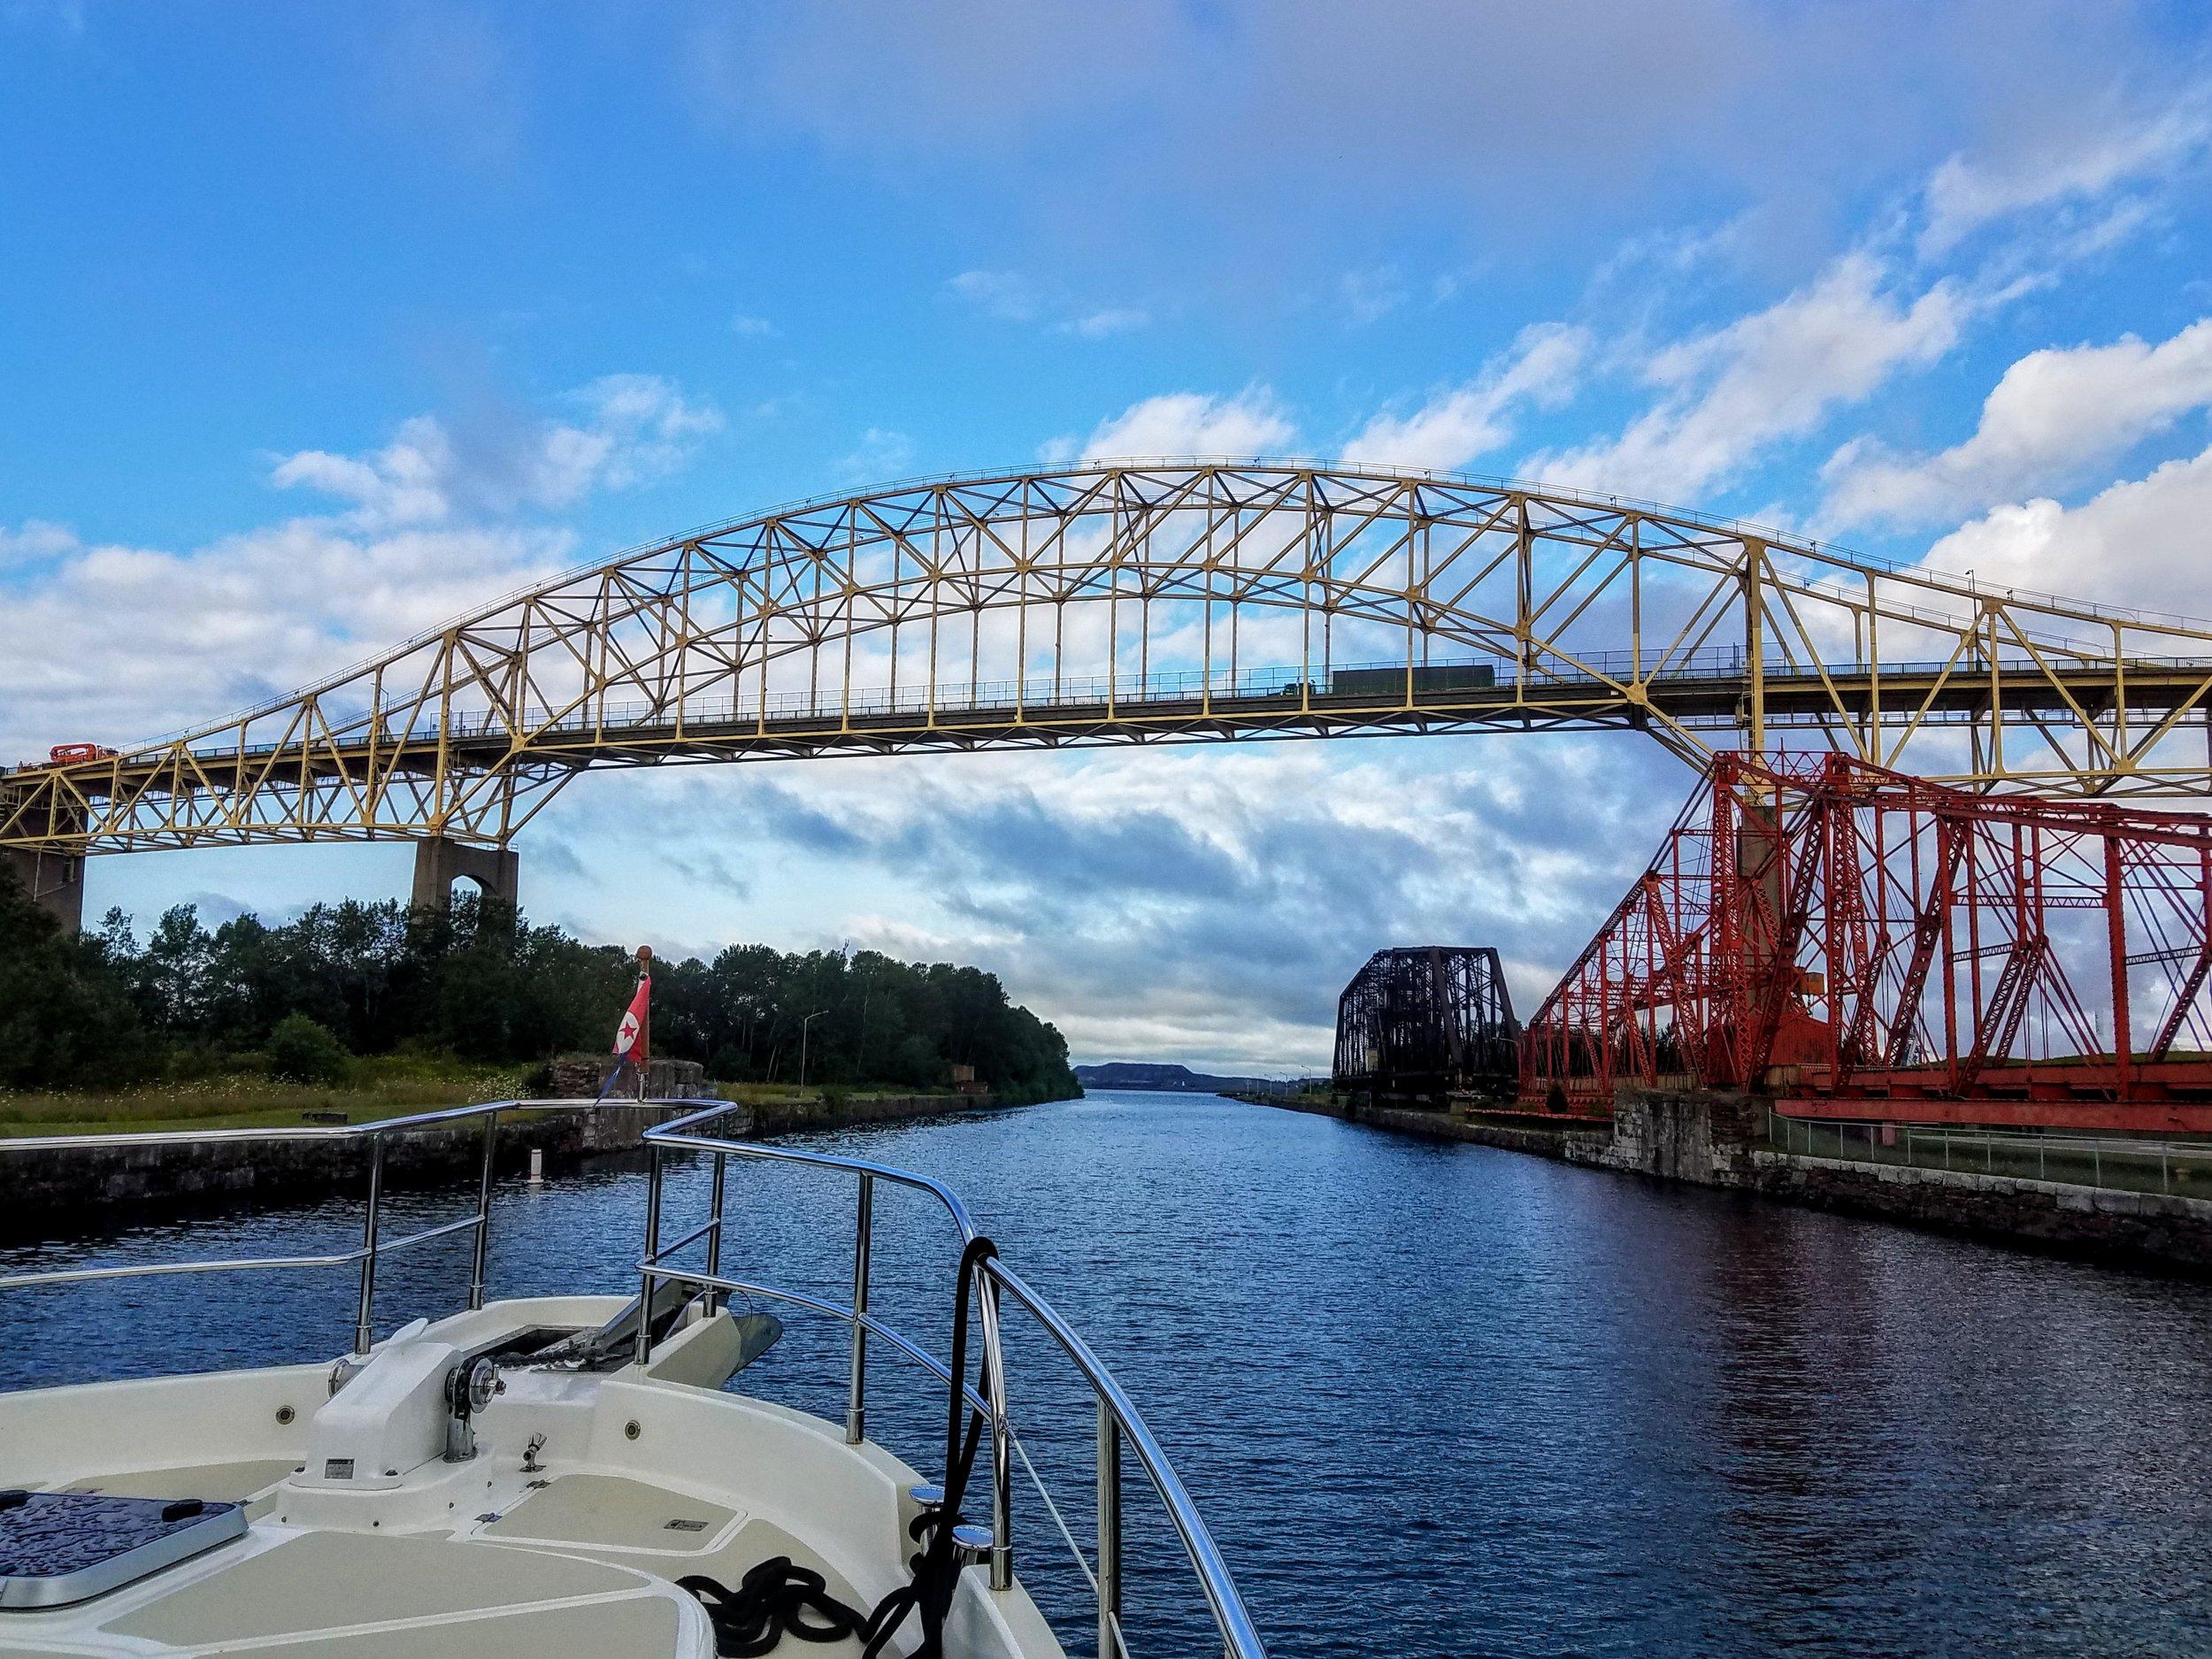 Going under the International Bridge to Lake Superior